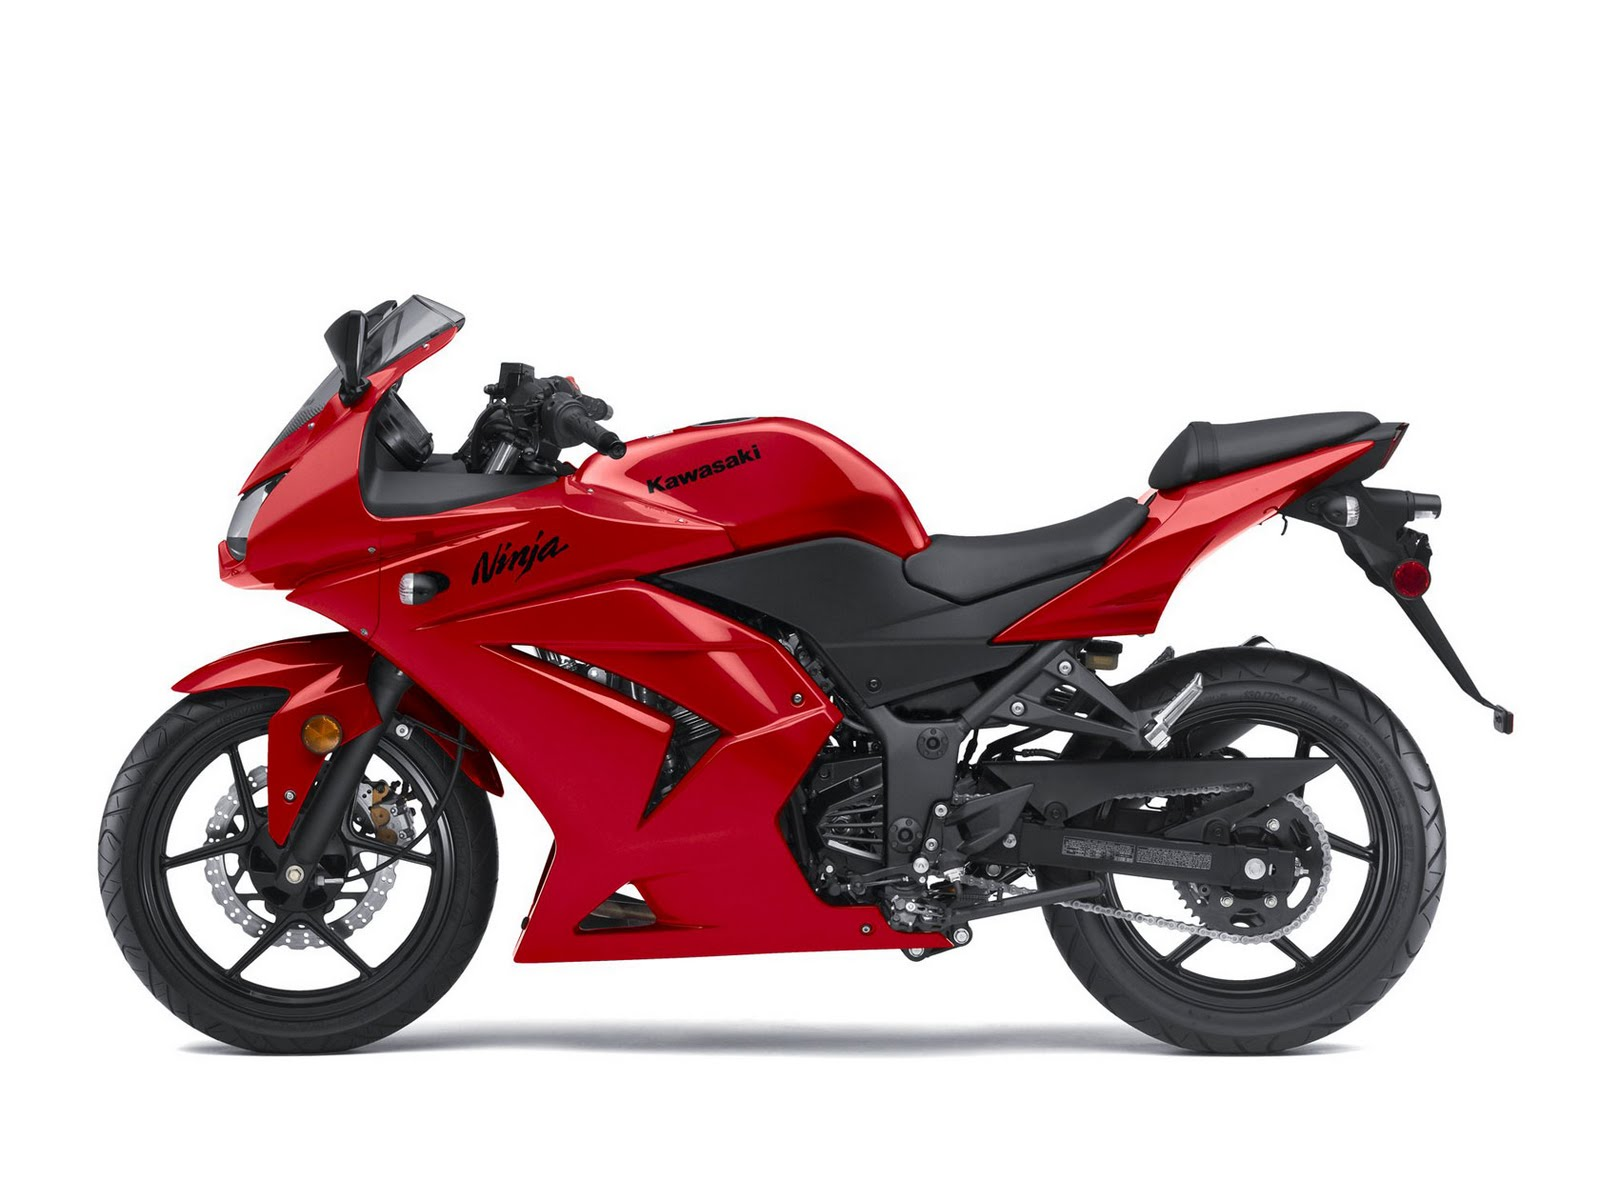 Kawasaki Ninja R Special Edition Fairings